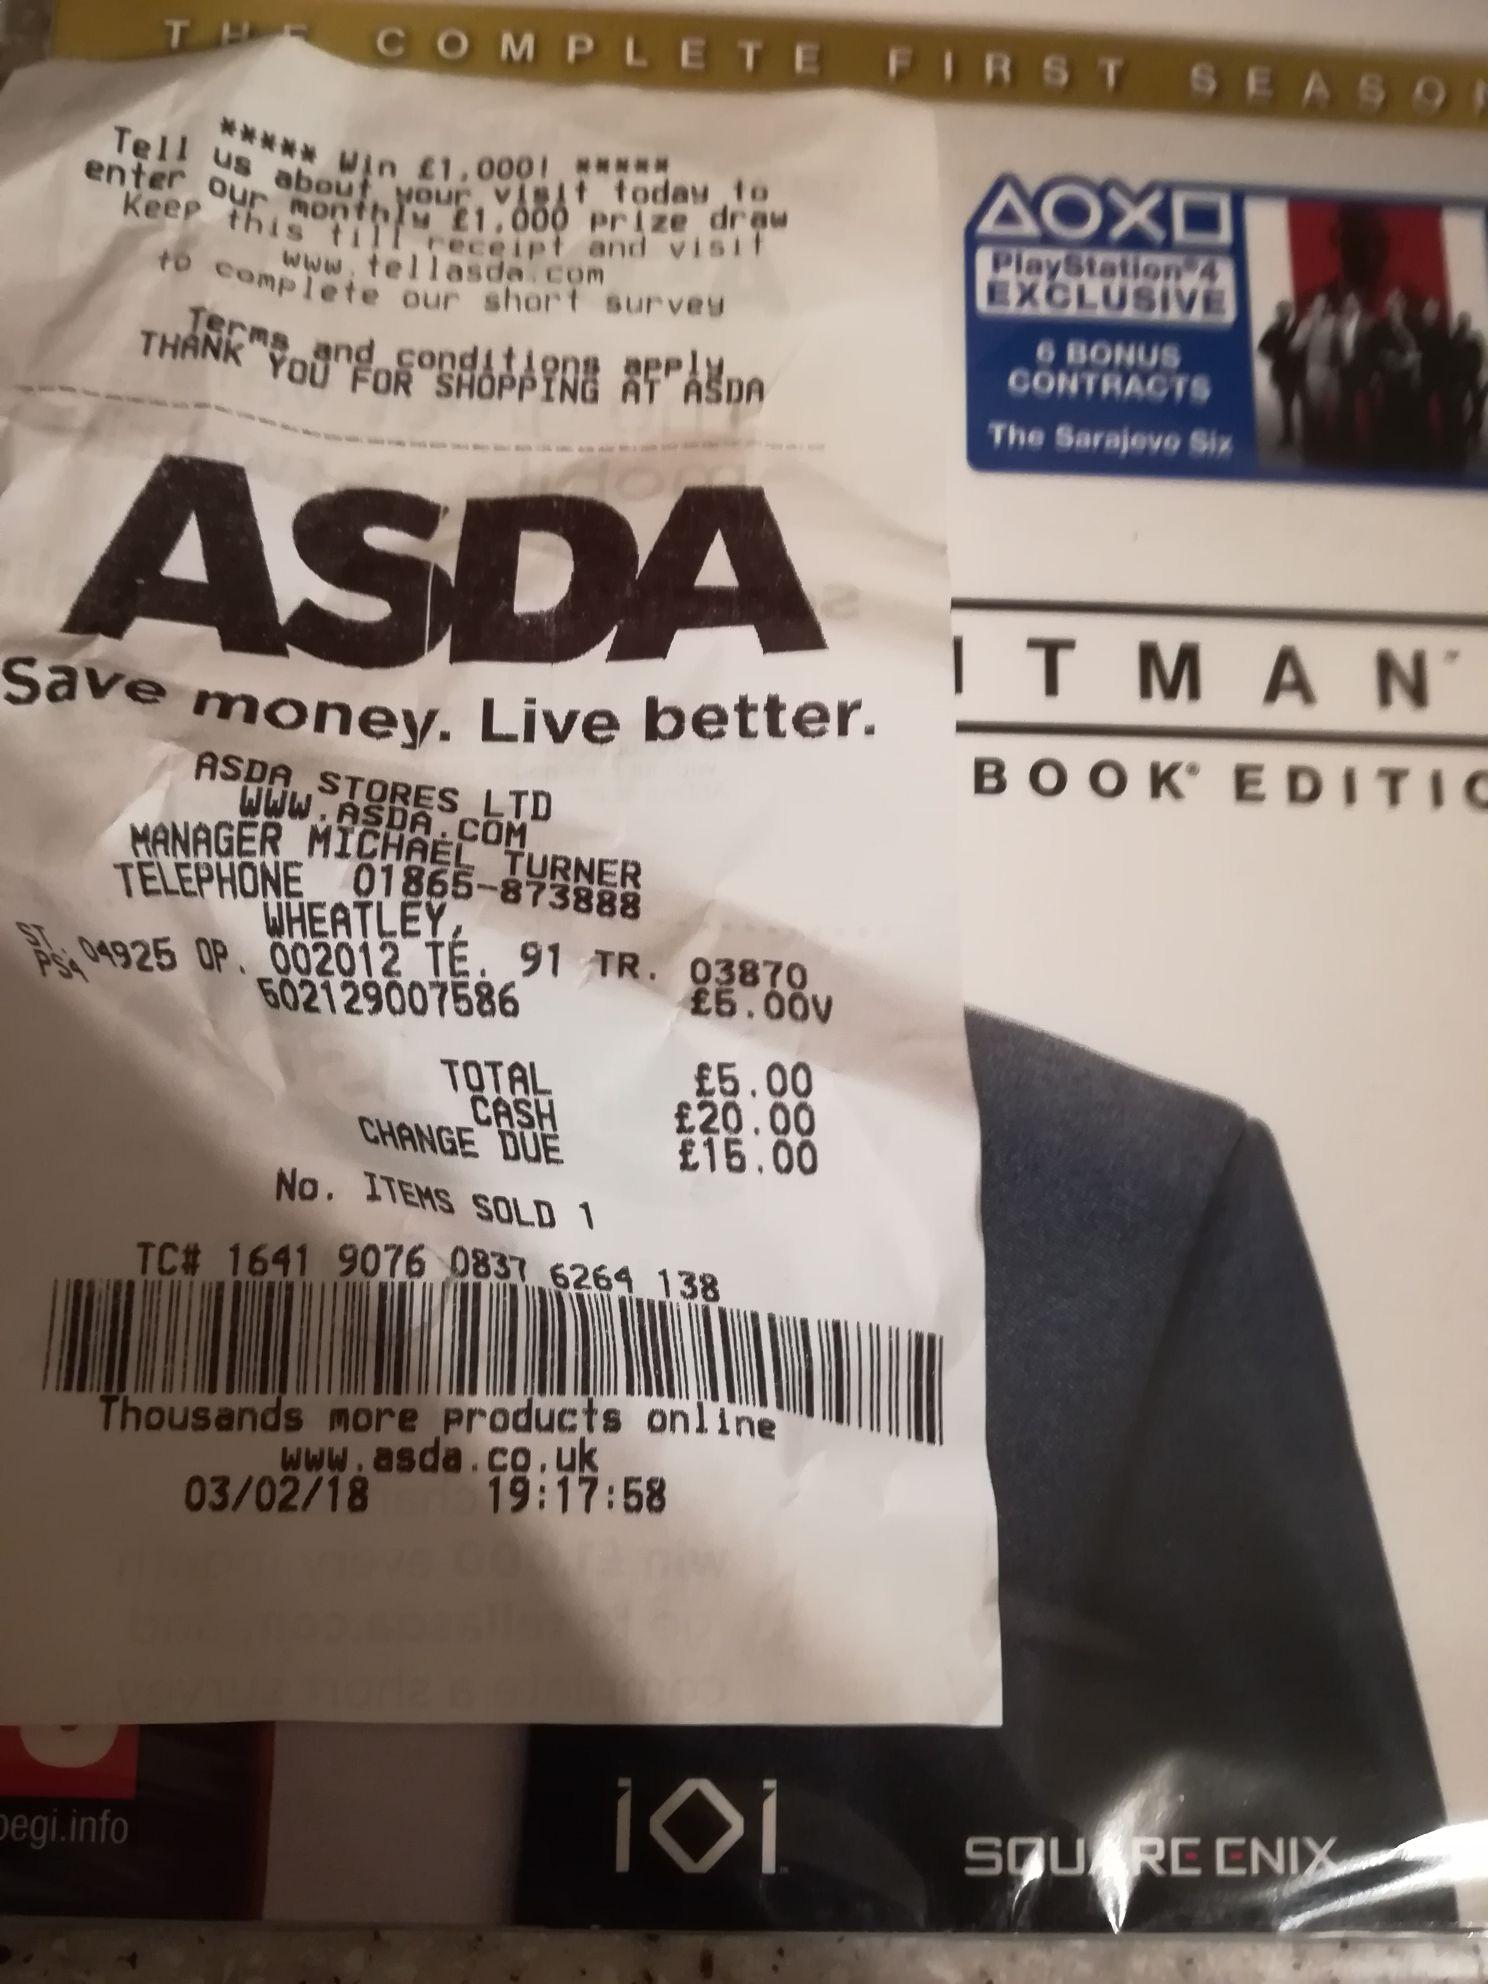 Hit Man Steel Book Edition Complete First Season - £5 instore @ Asda